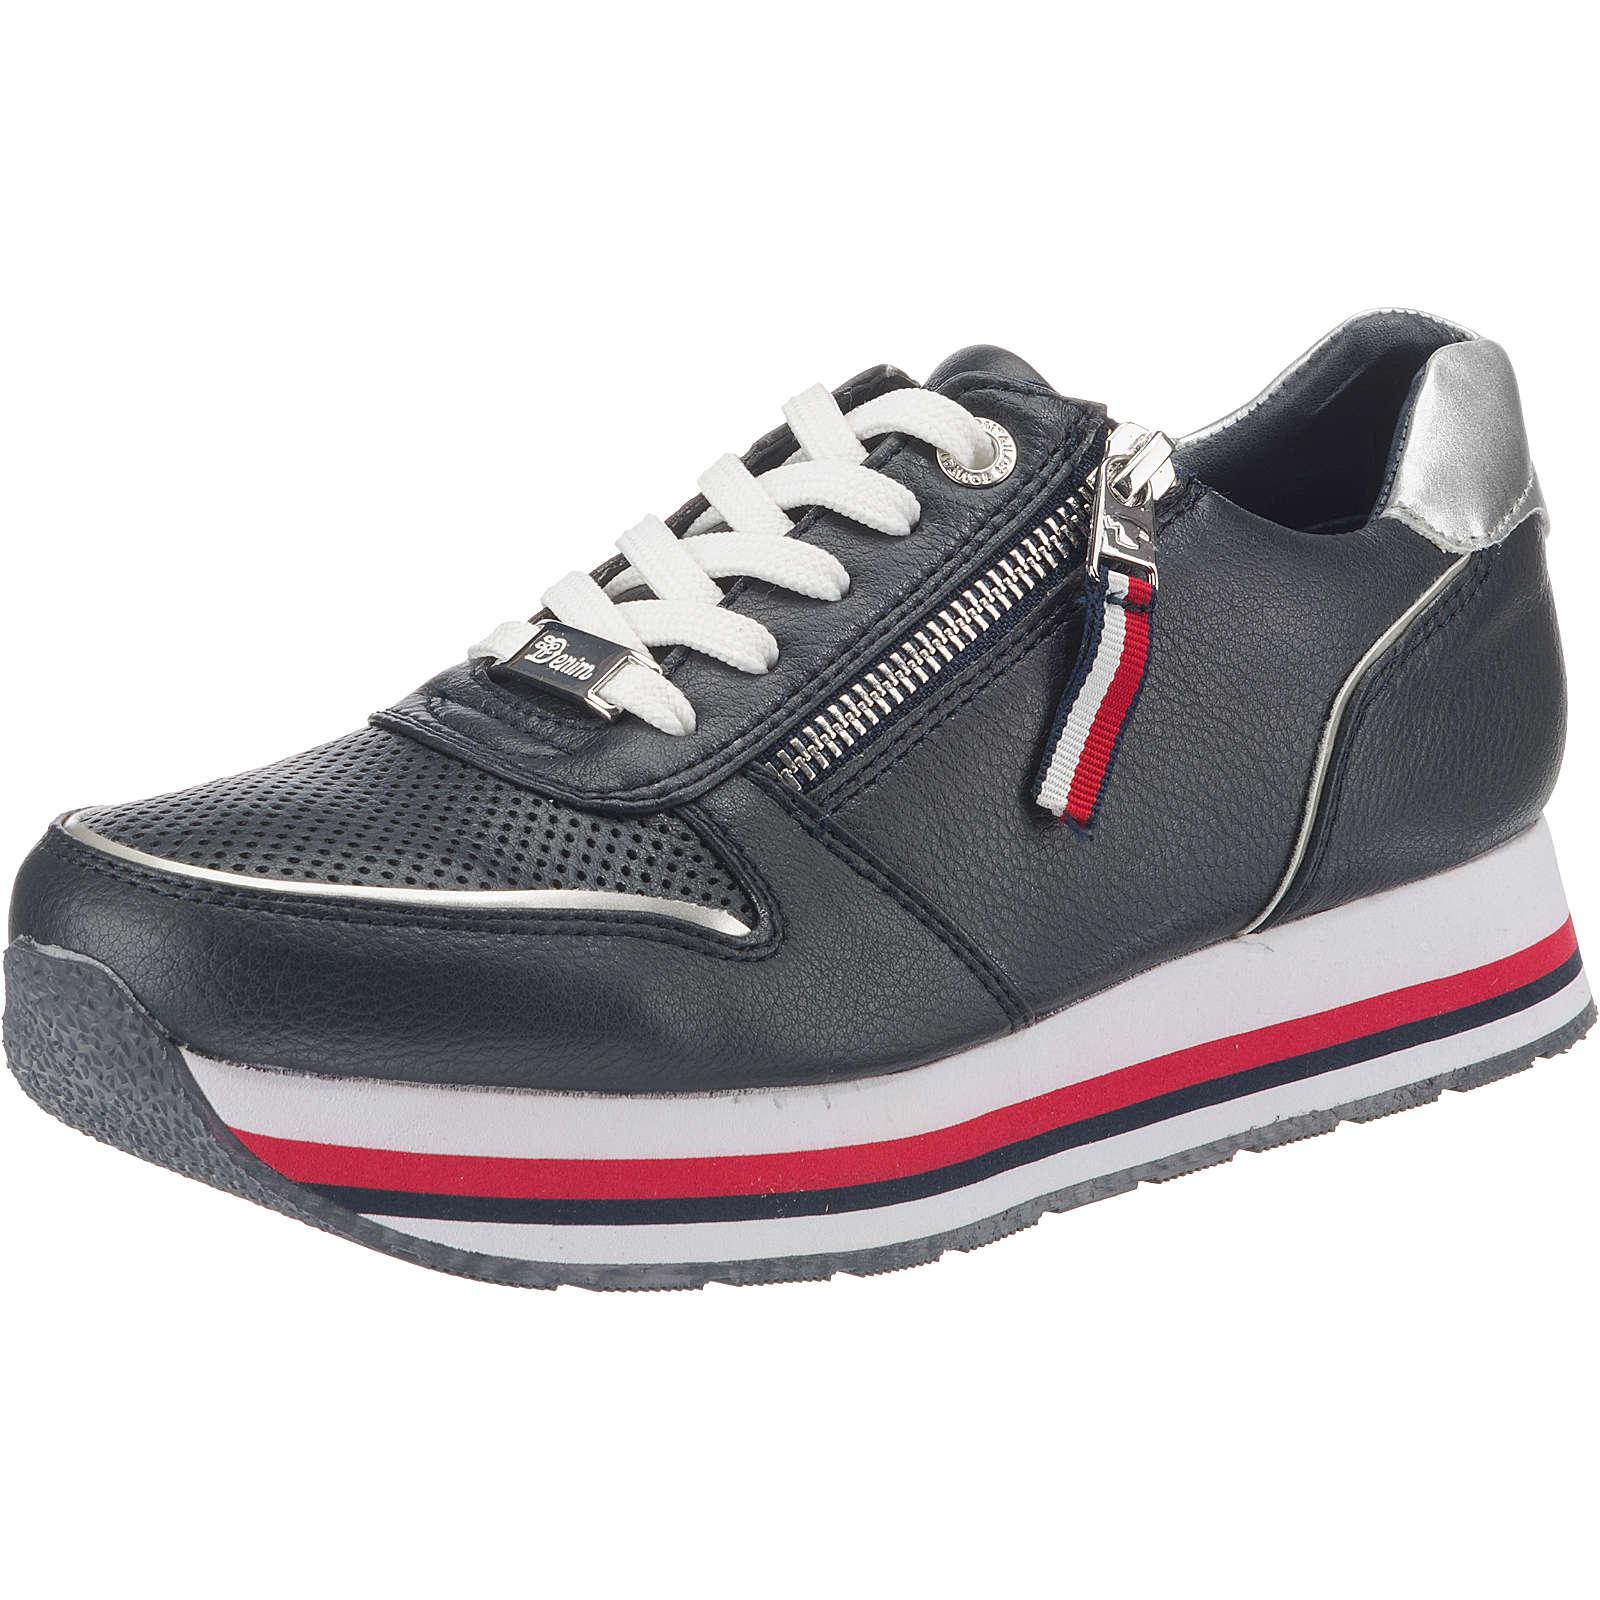 TOM TAILOR Sneakers Low dunkelblau Damen Gr. 37